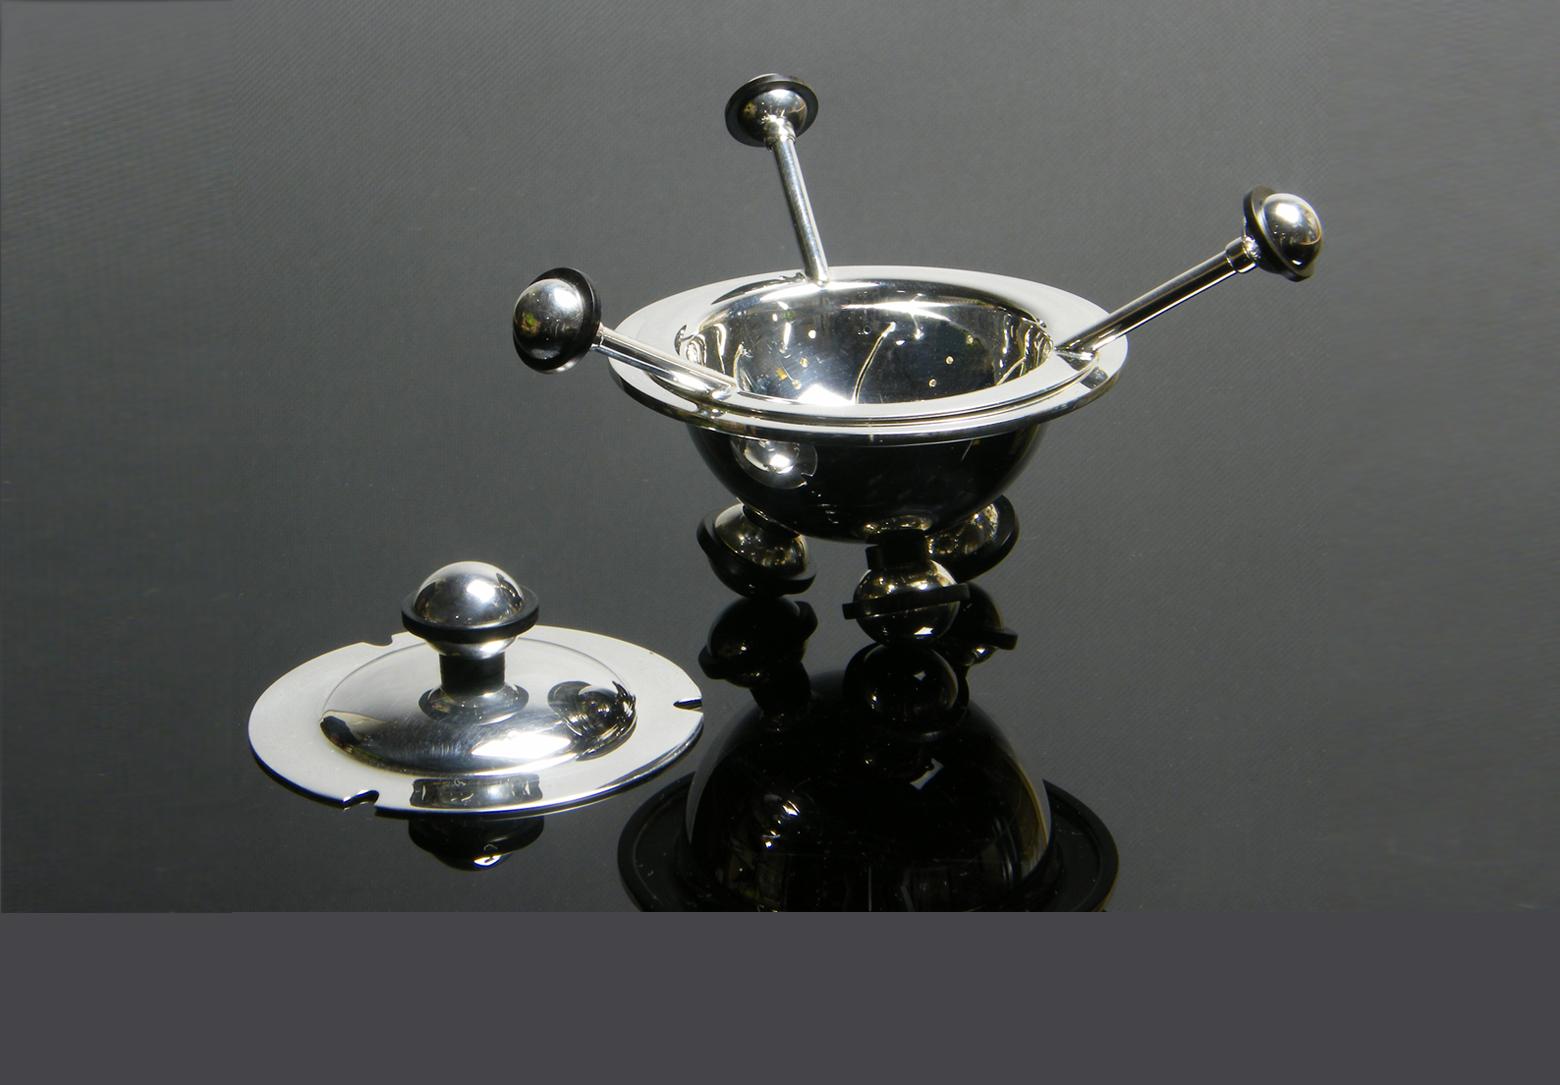 Orbit Tea Strainer